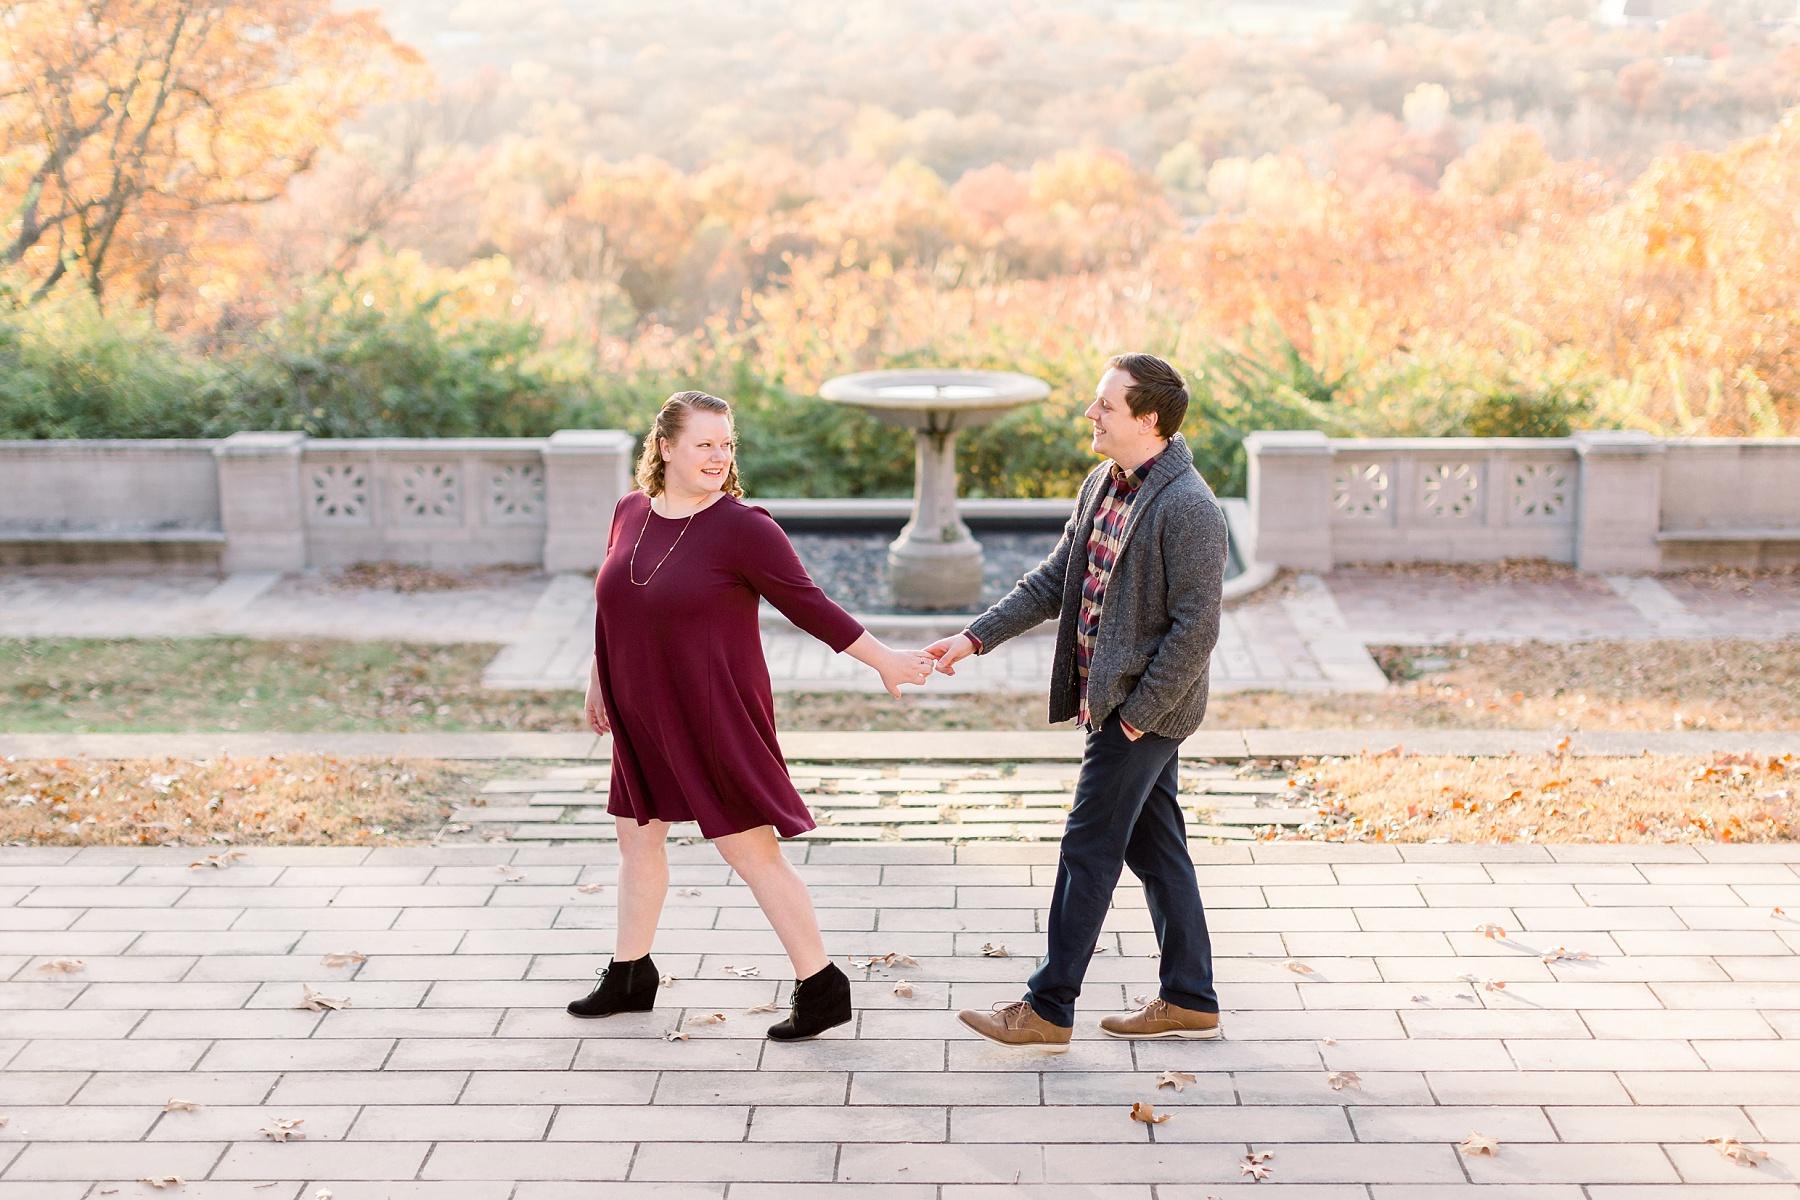 adventurous-authentic-wedding-engagement-photography-kansas-city-elizabeth-ladean-photo_5399.jpg